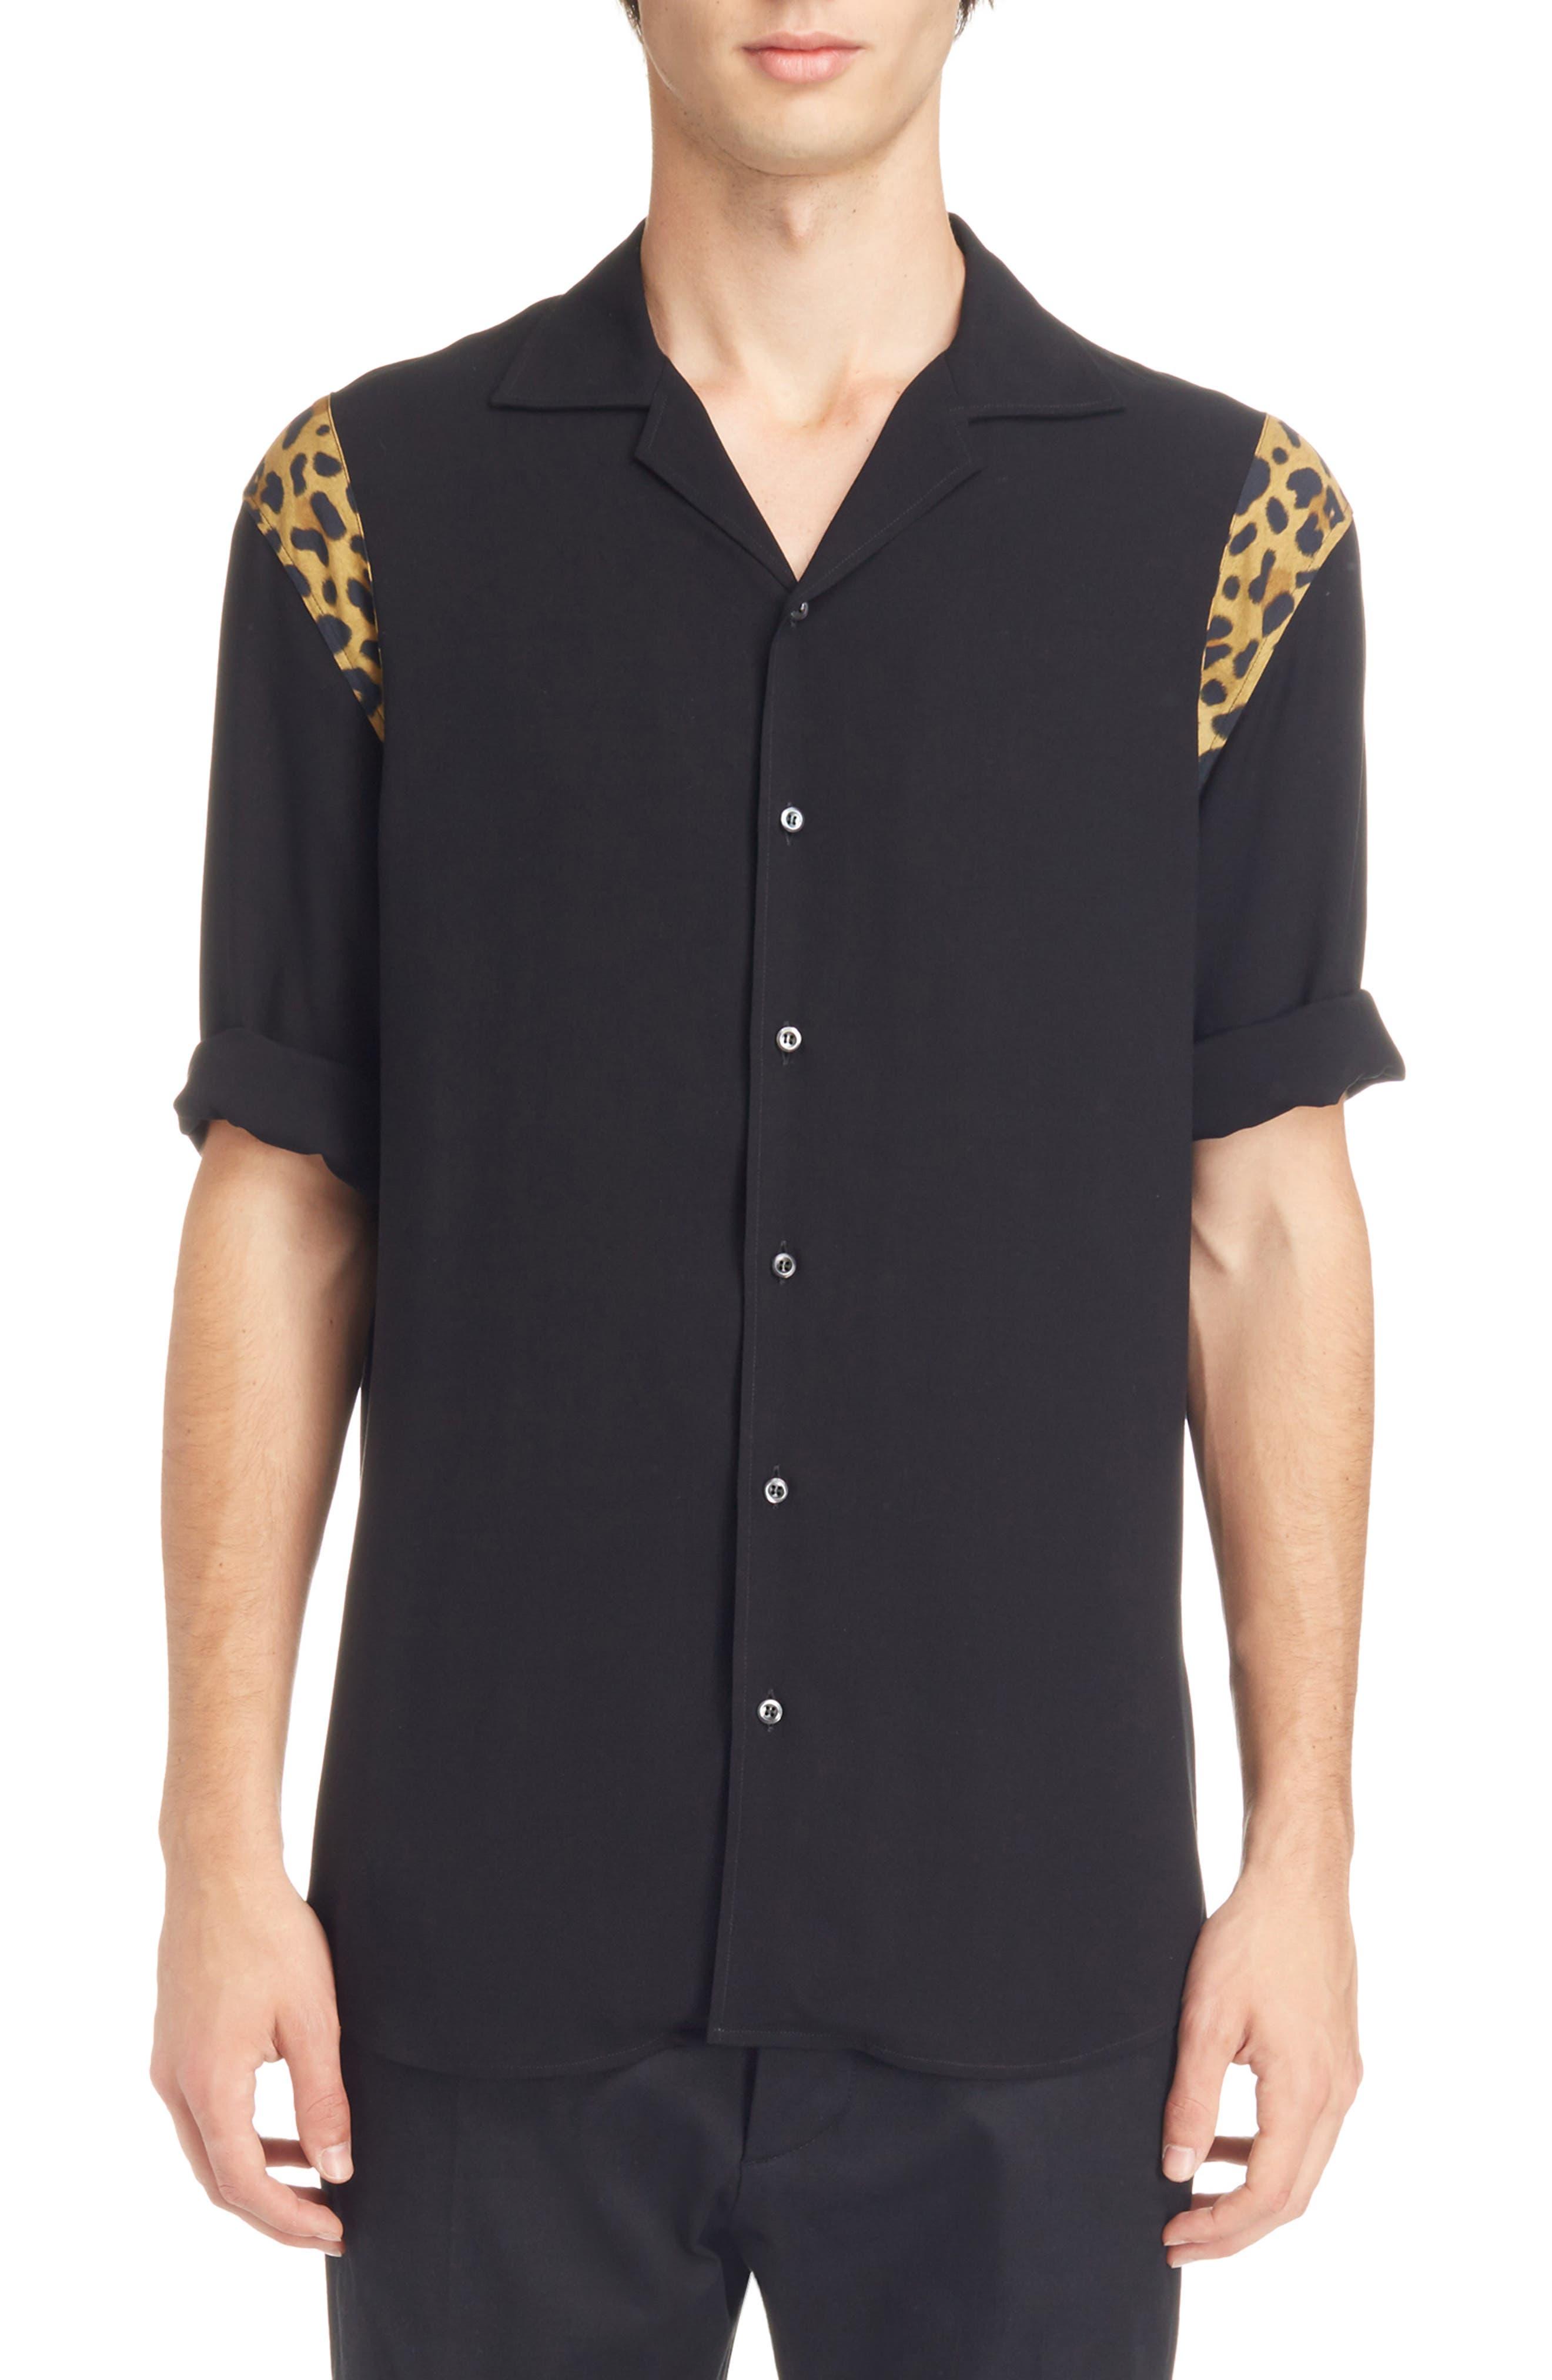 Main Image - Dsquared2 Bowling Shirt